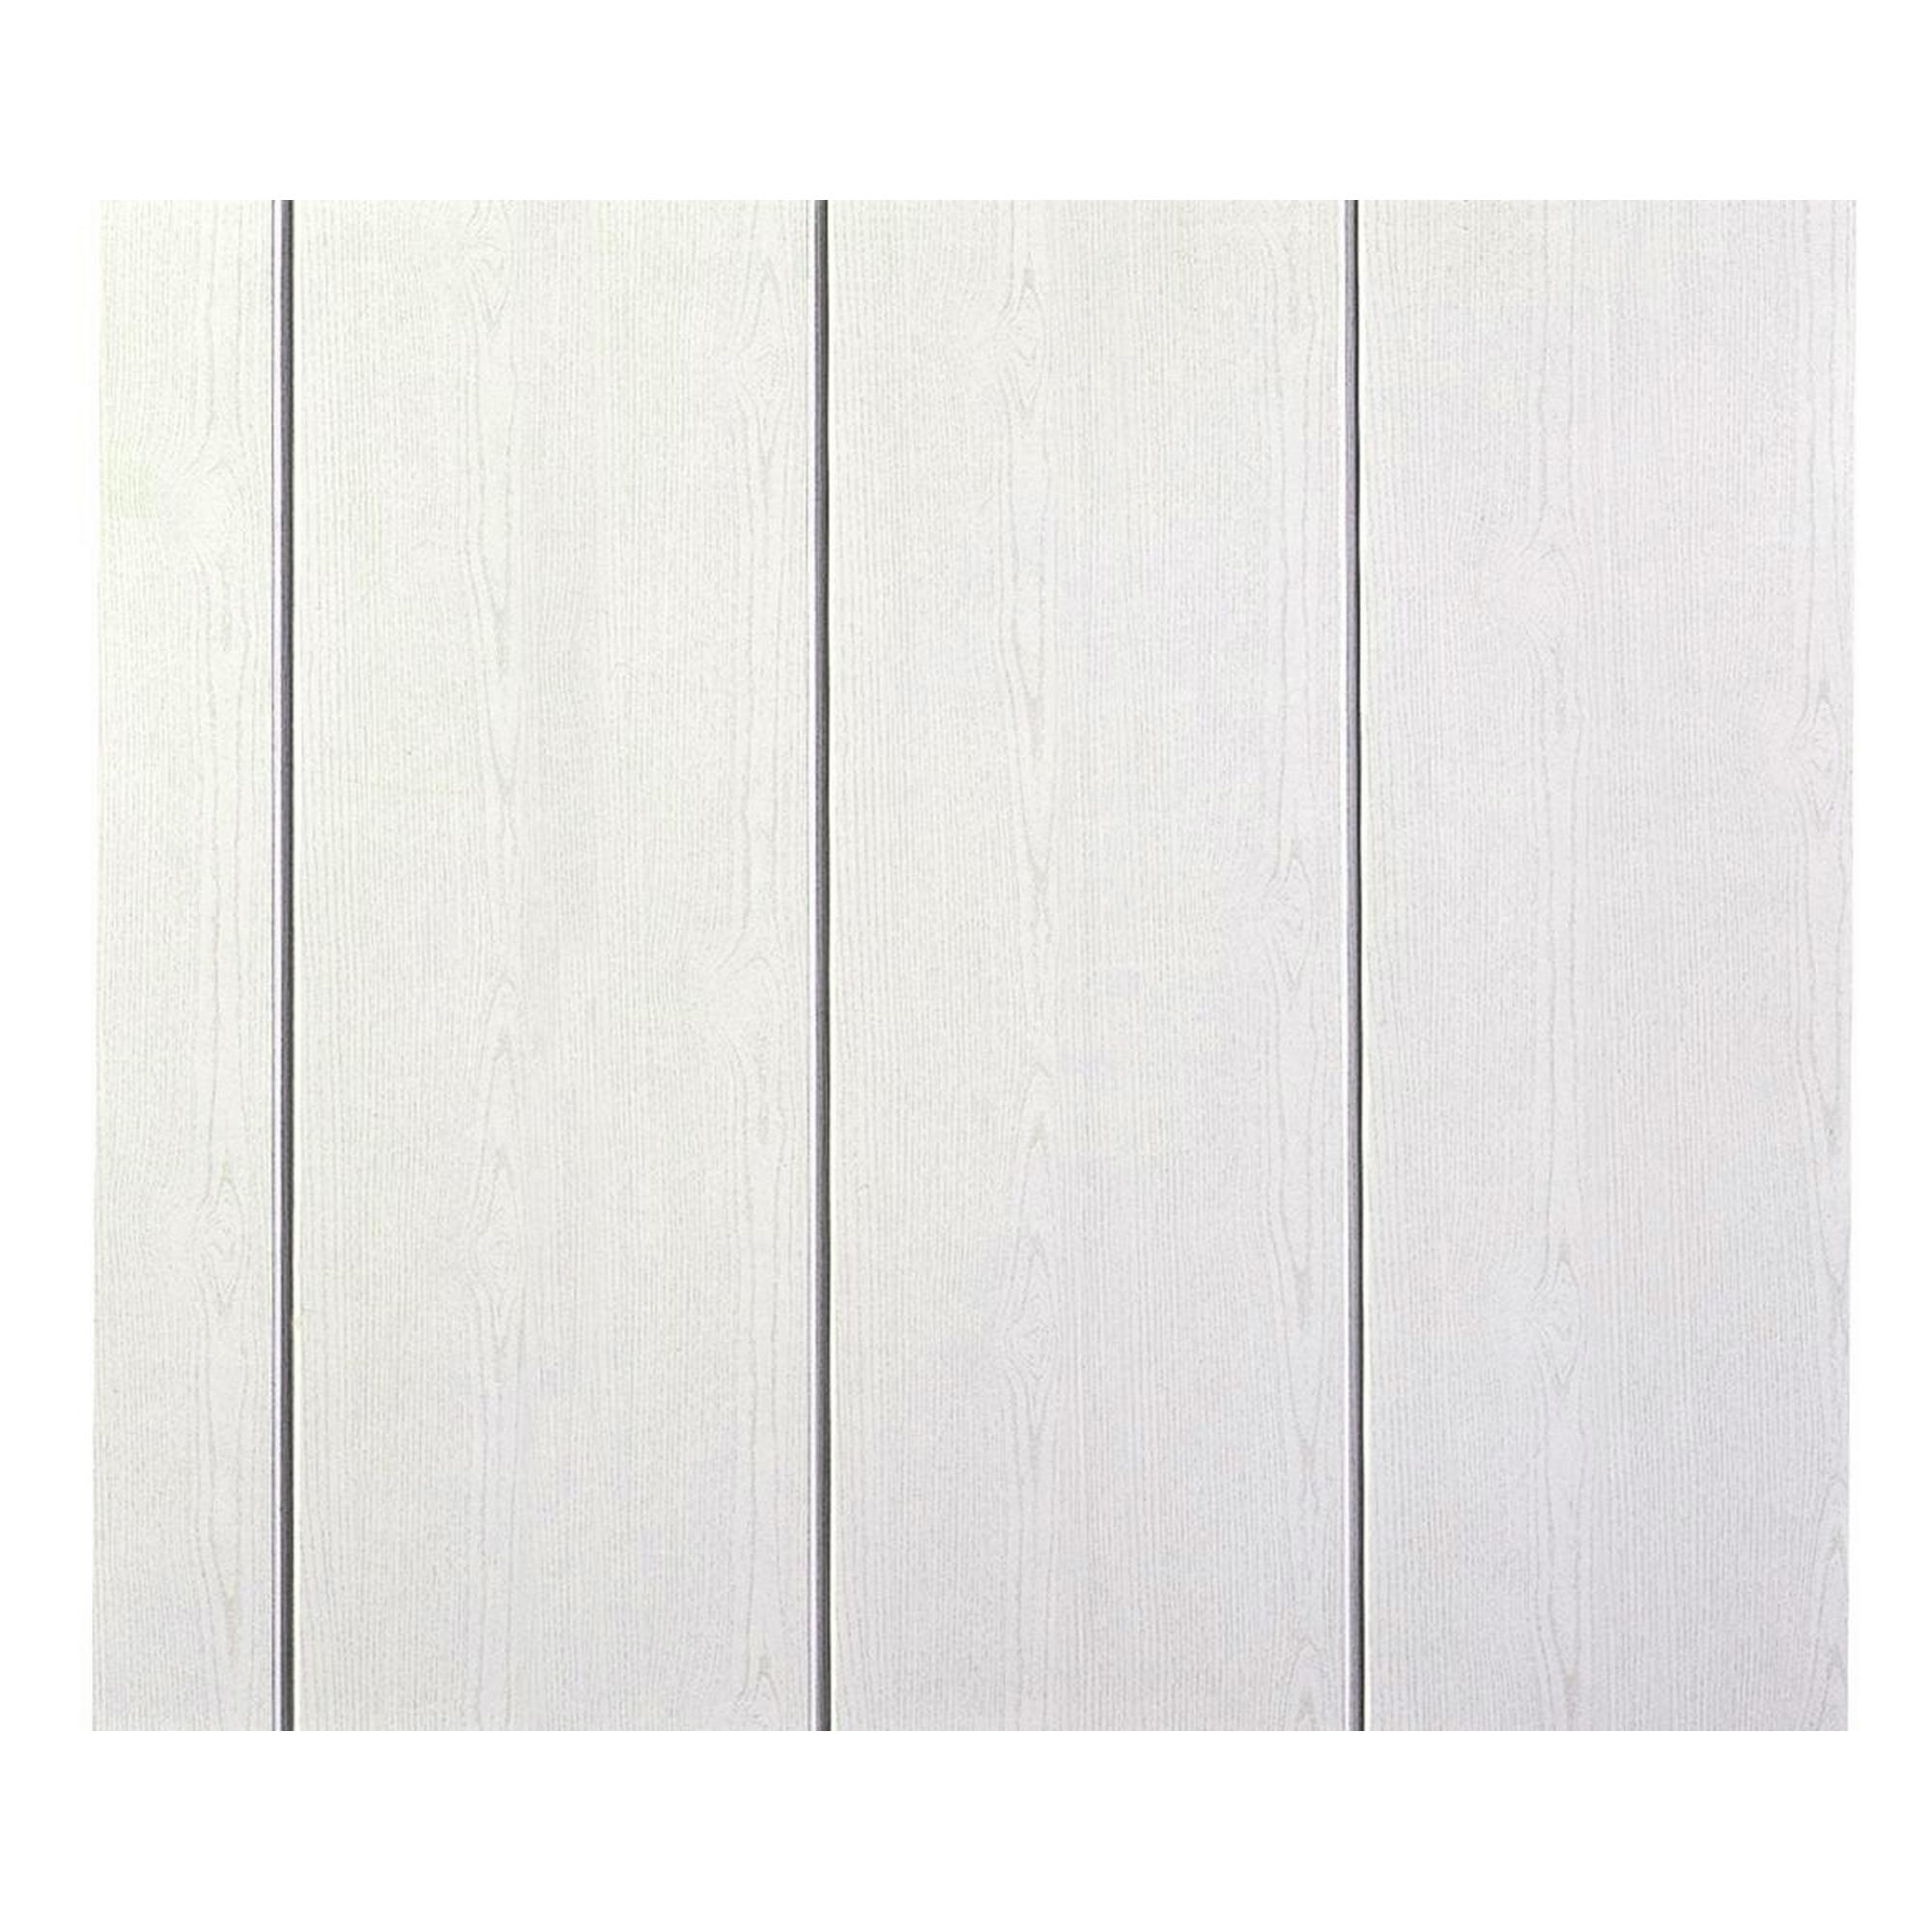 B220 Paneele Esche weiß, 220 x 2205 x 20,20 cm, 20 Stück